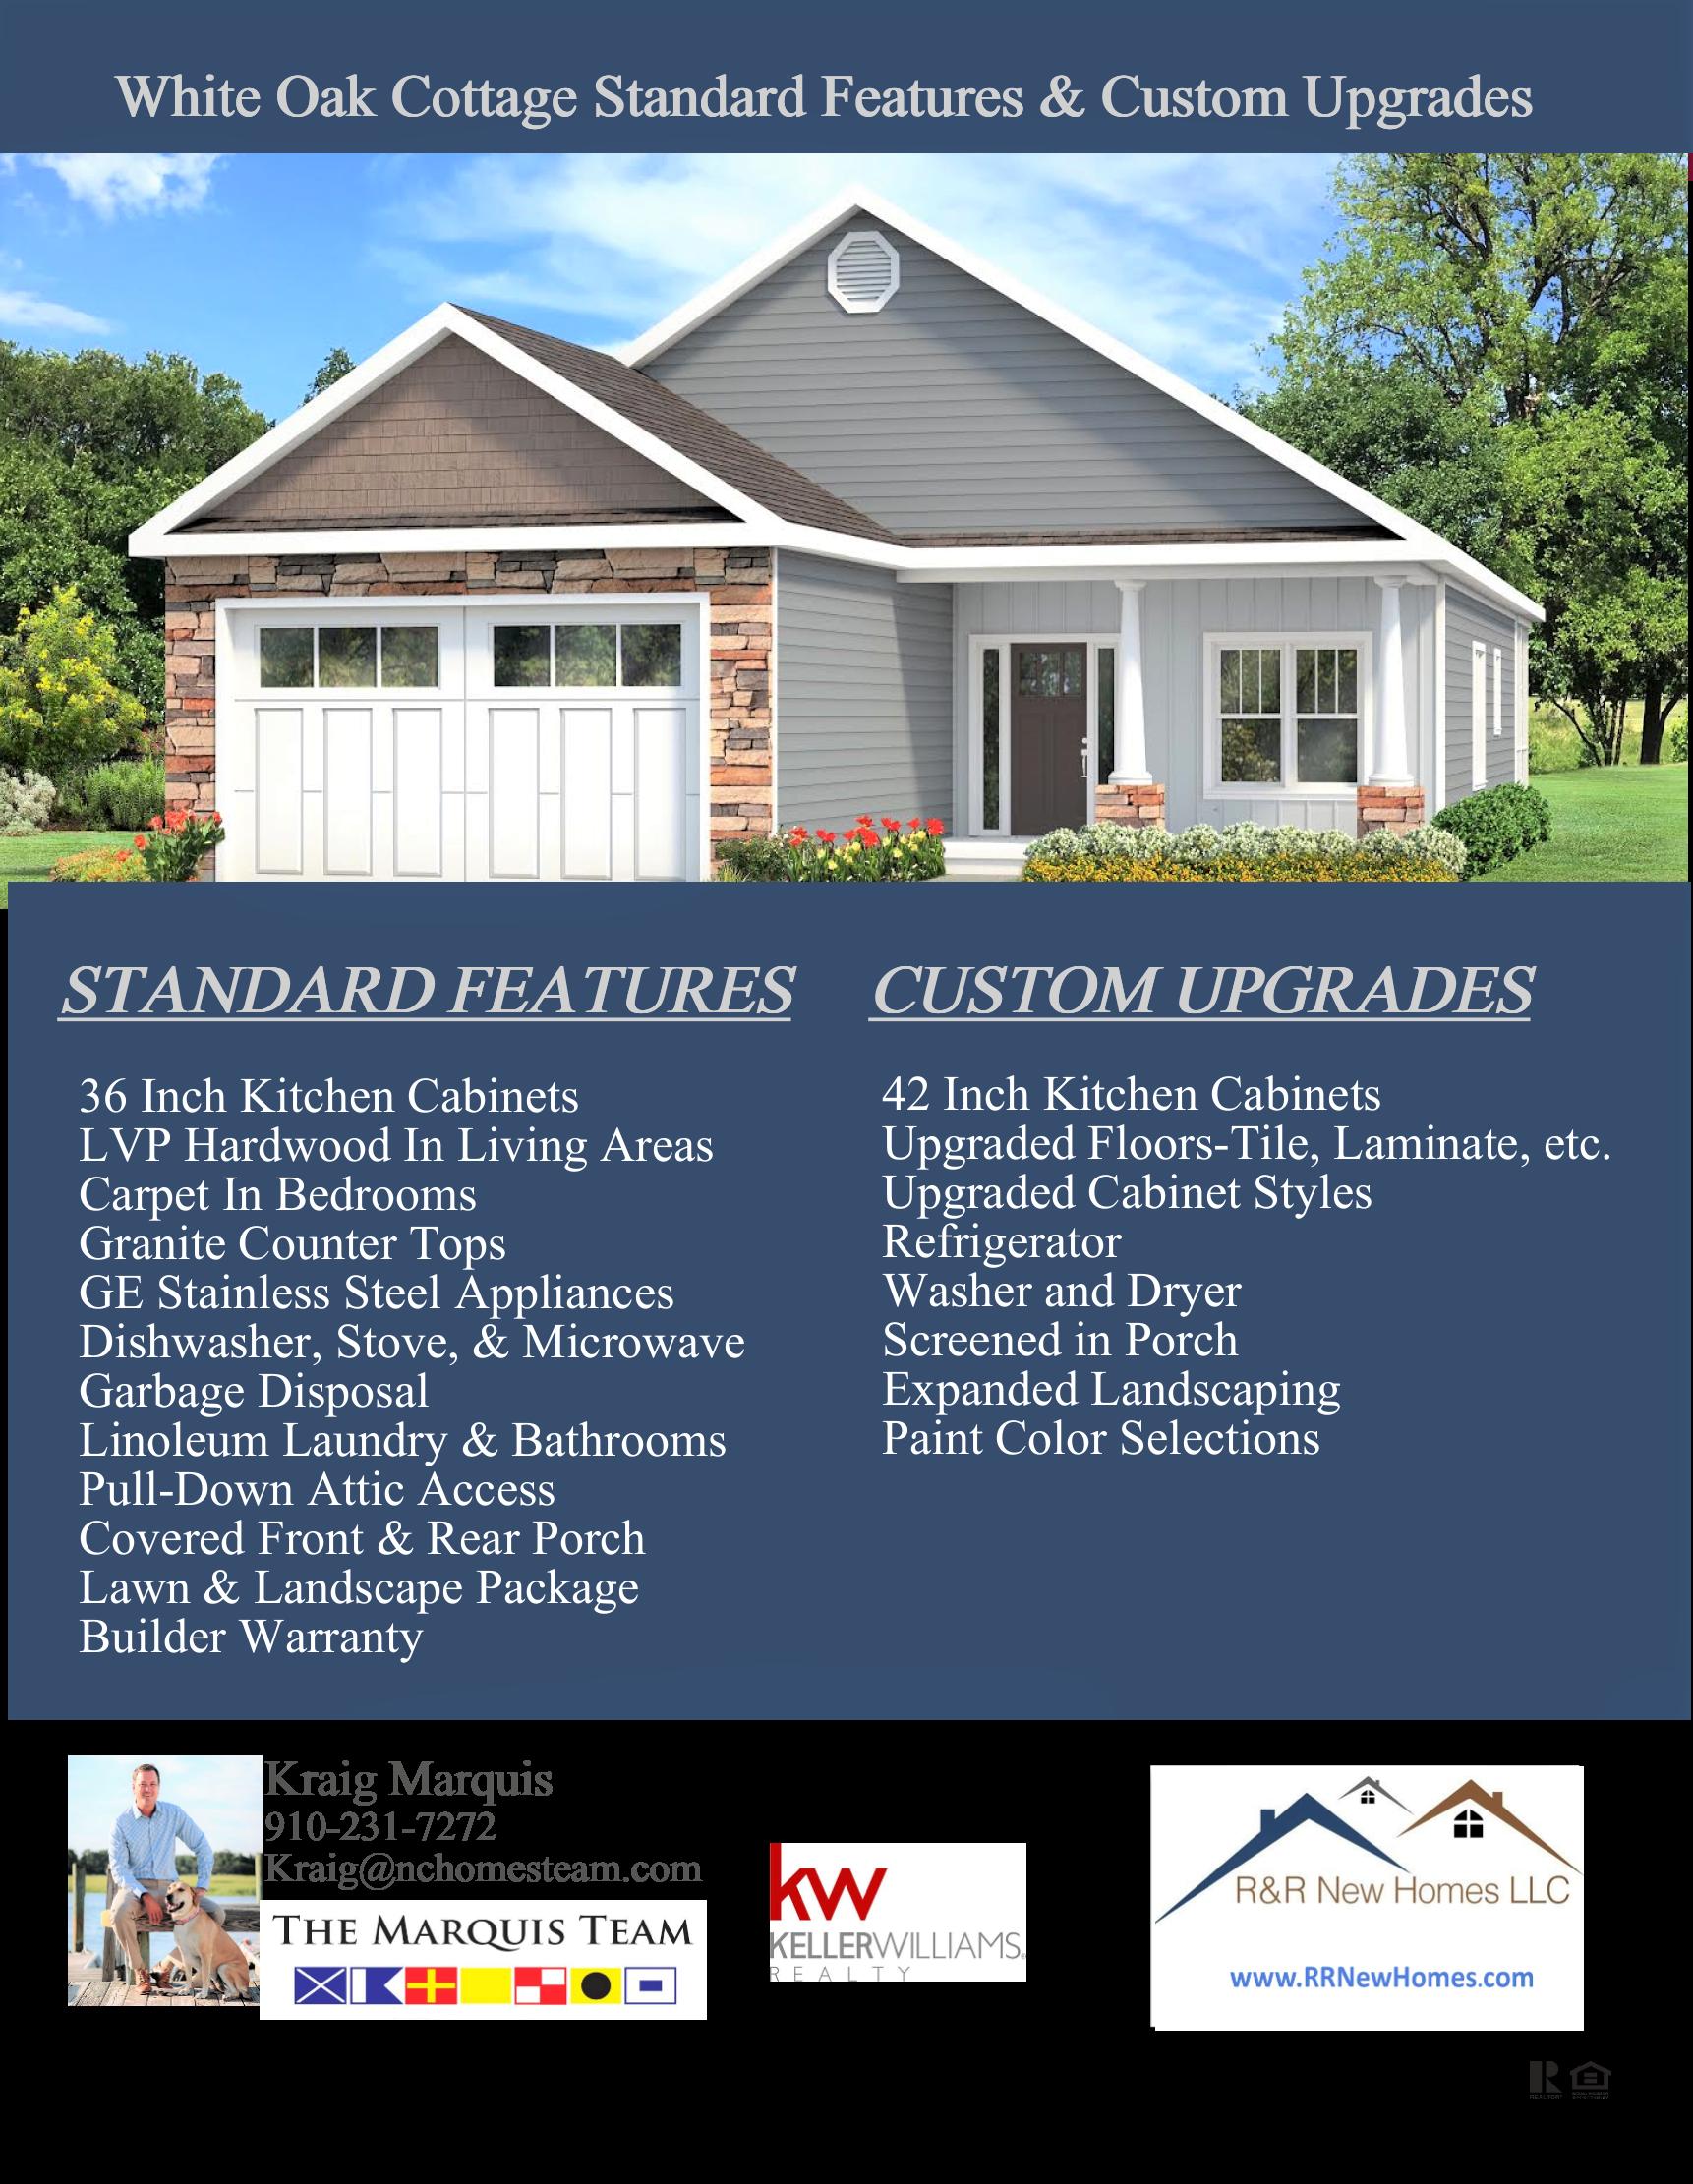 White Oak Standard Features List.png